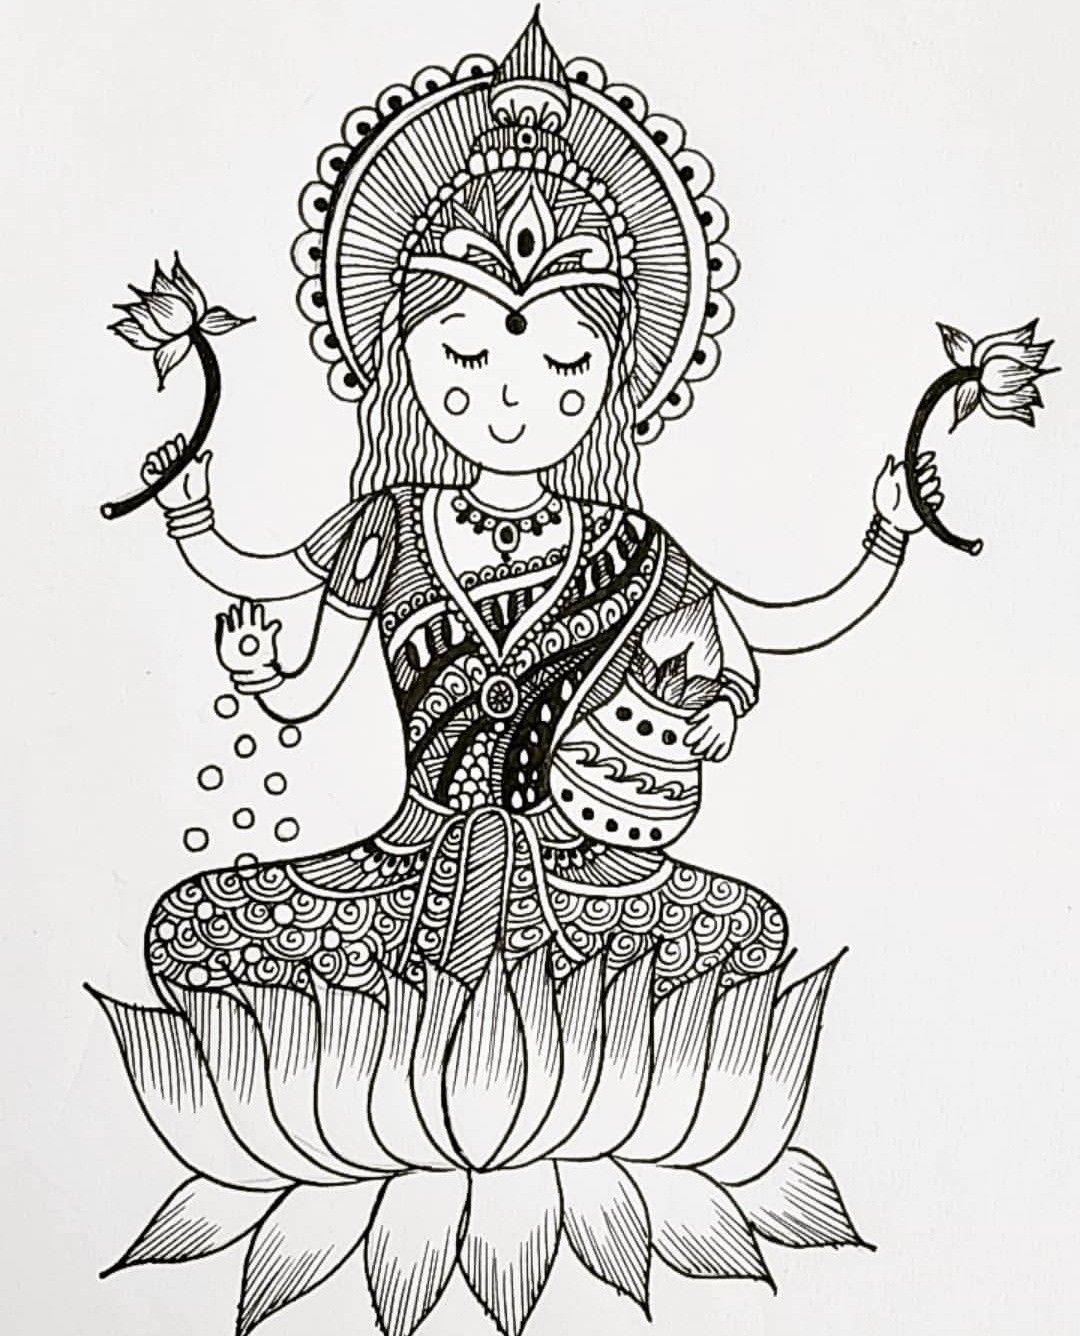 Wish you very happy diwali to everyone 🌷 happy diwali